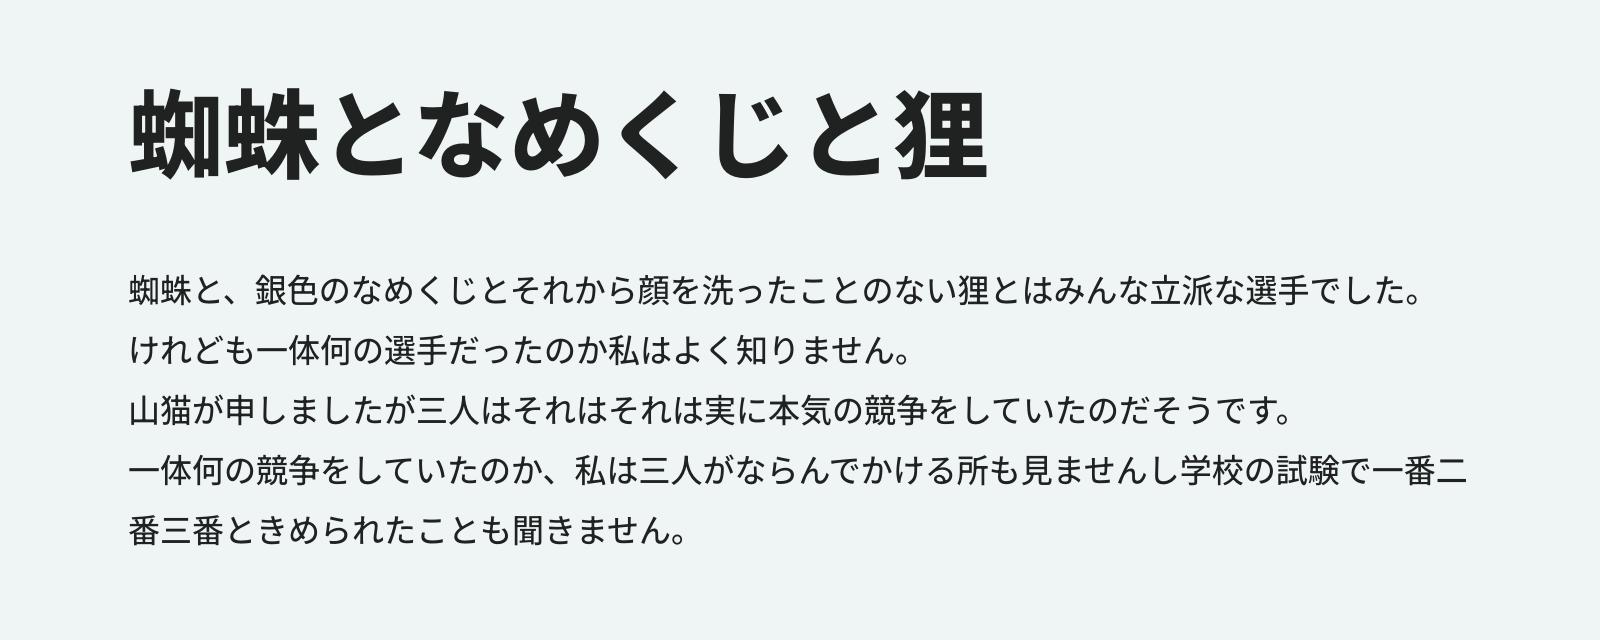 Noto Sans JPを適用したページ